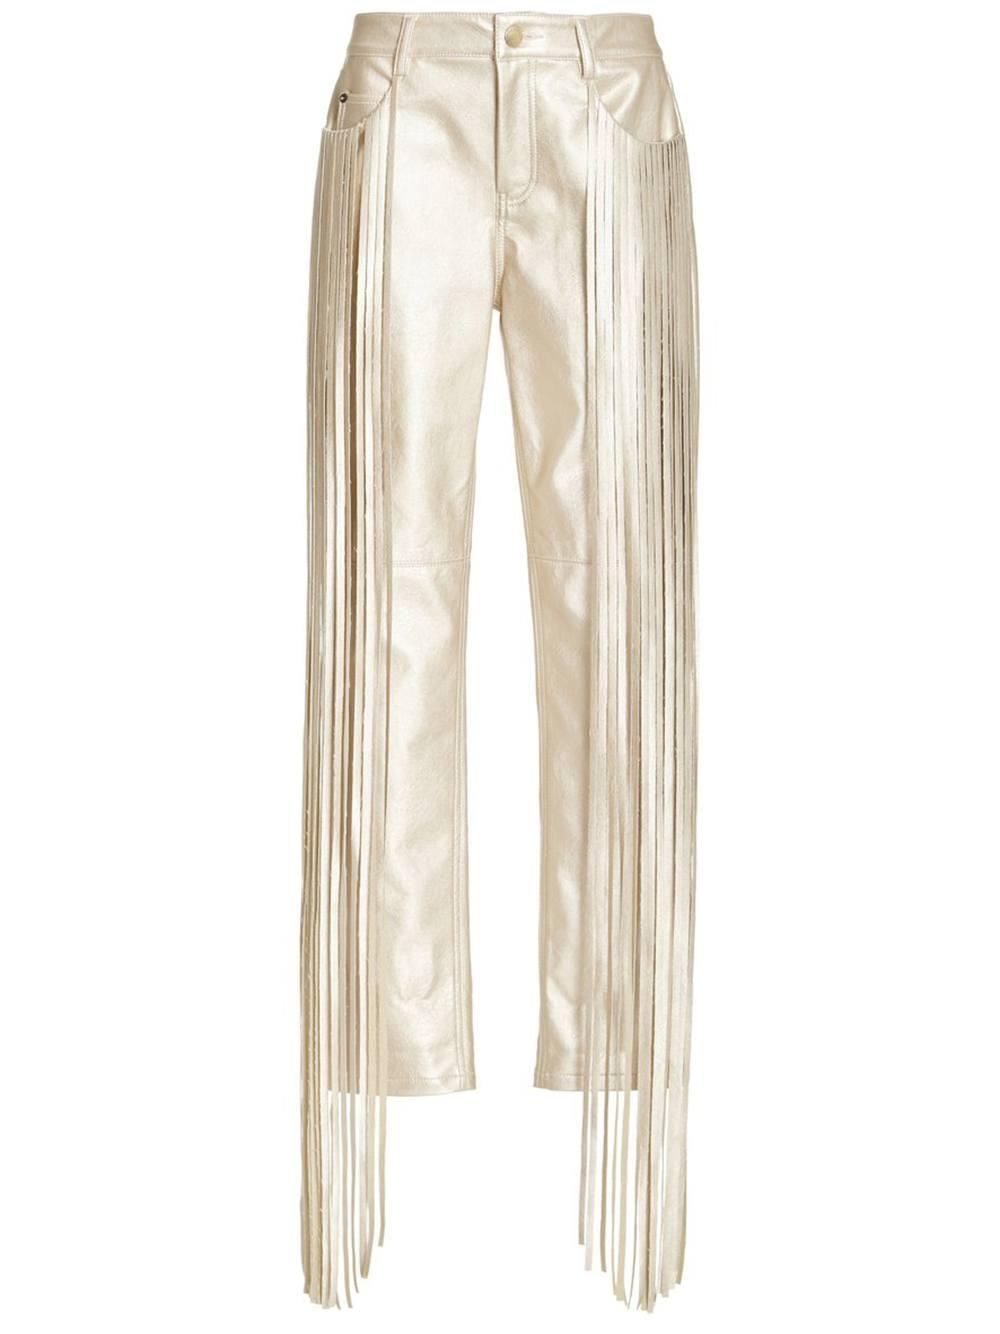 Vegan Leather Pant With Fringe Item # HA21P200-34